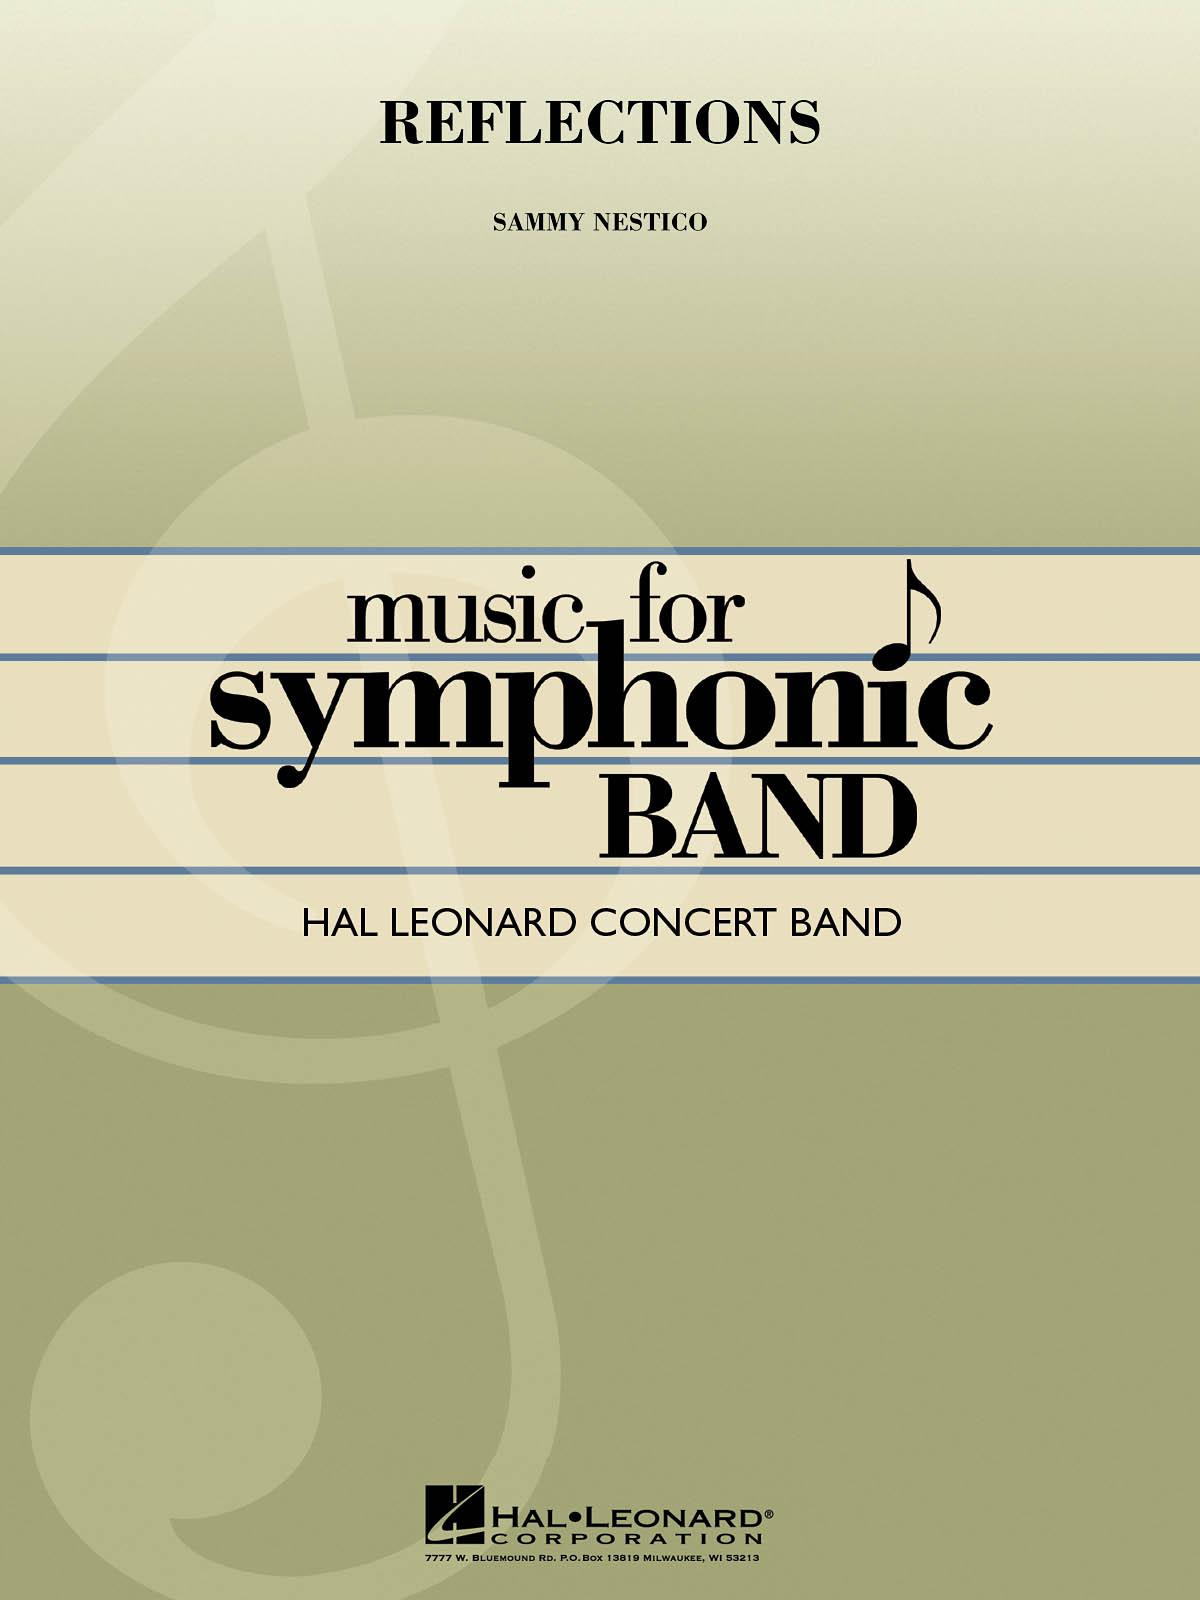 Sammy Nestico: Reflections: Concert Band: Score & Parts